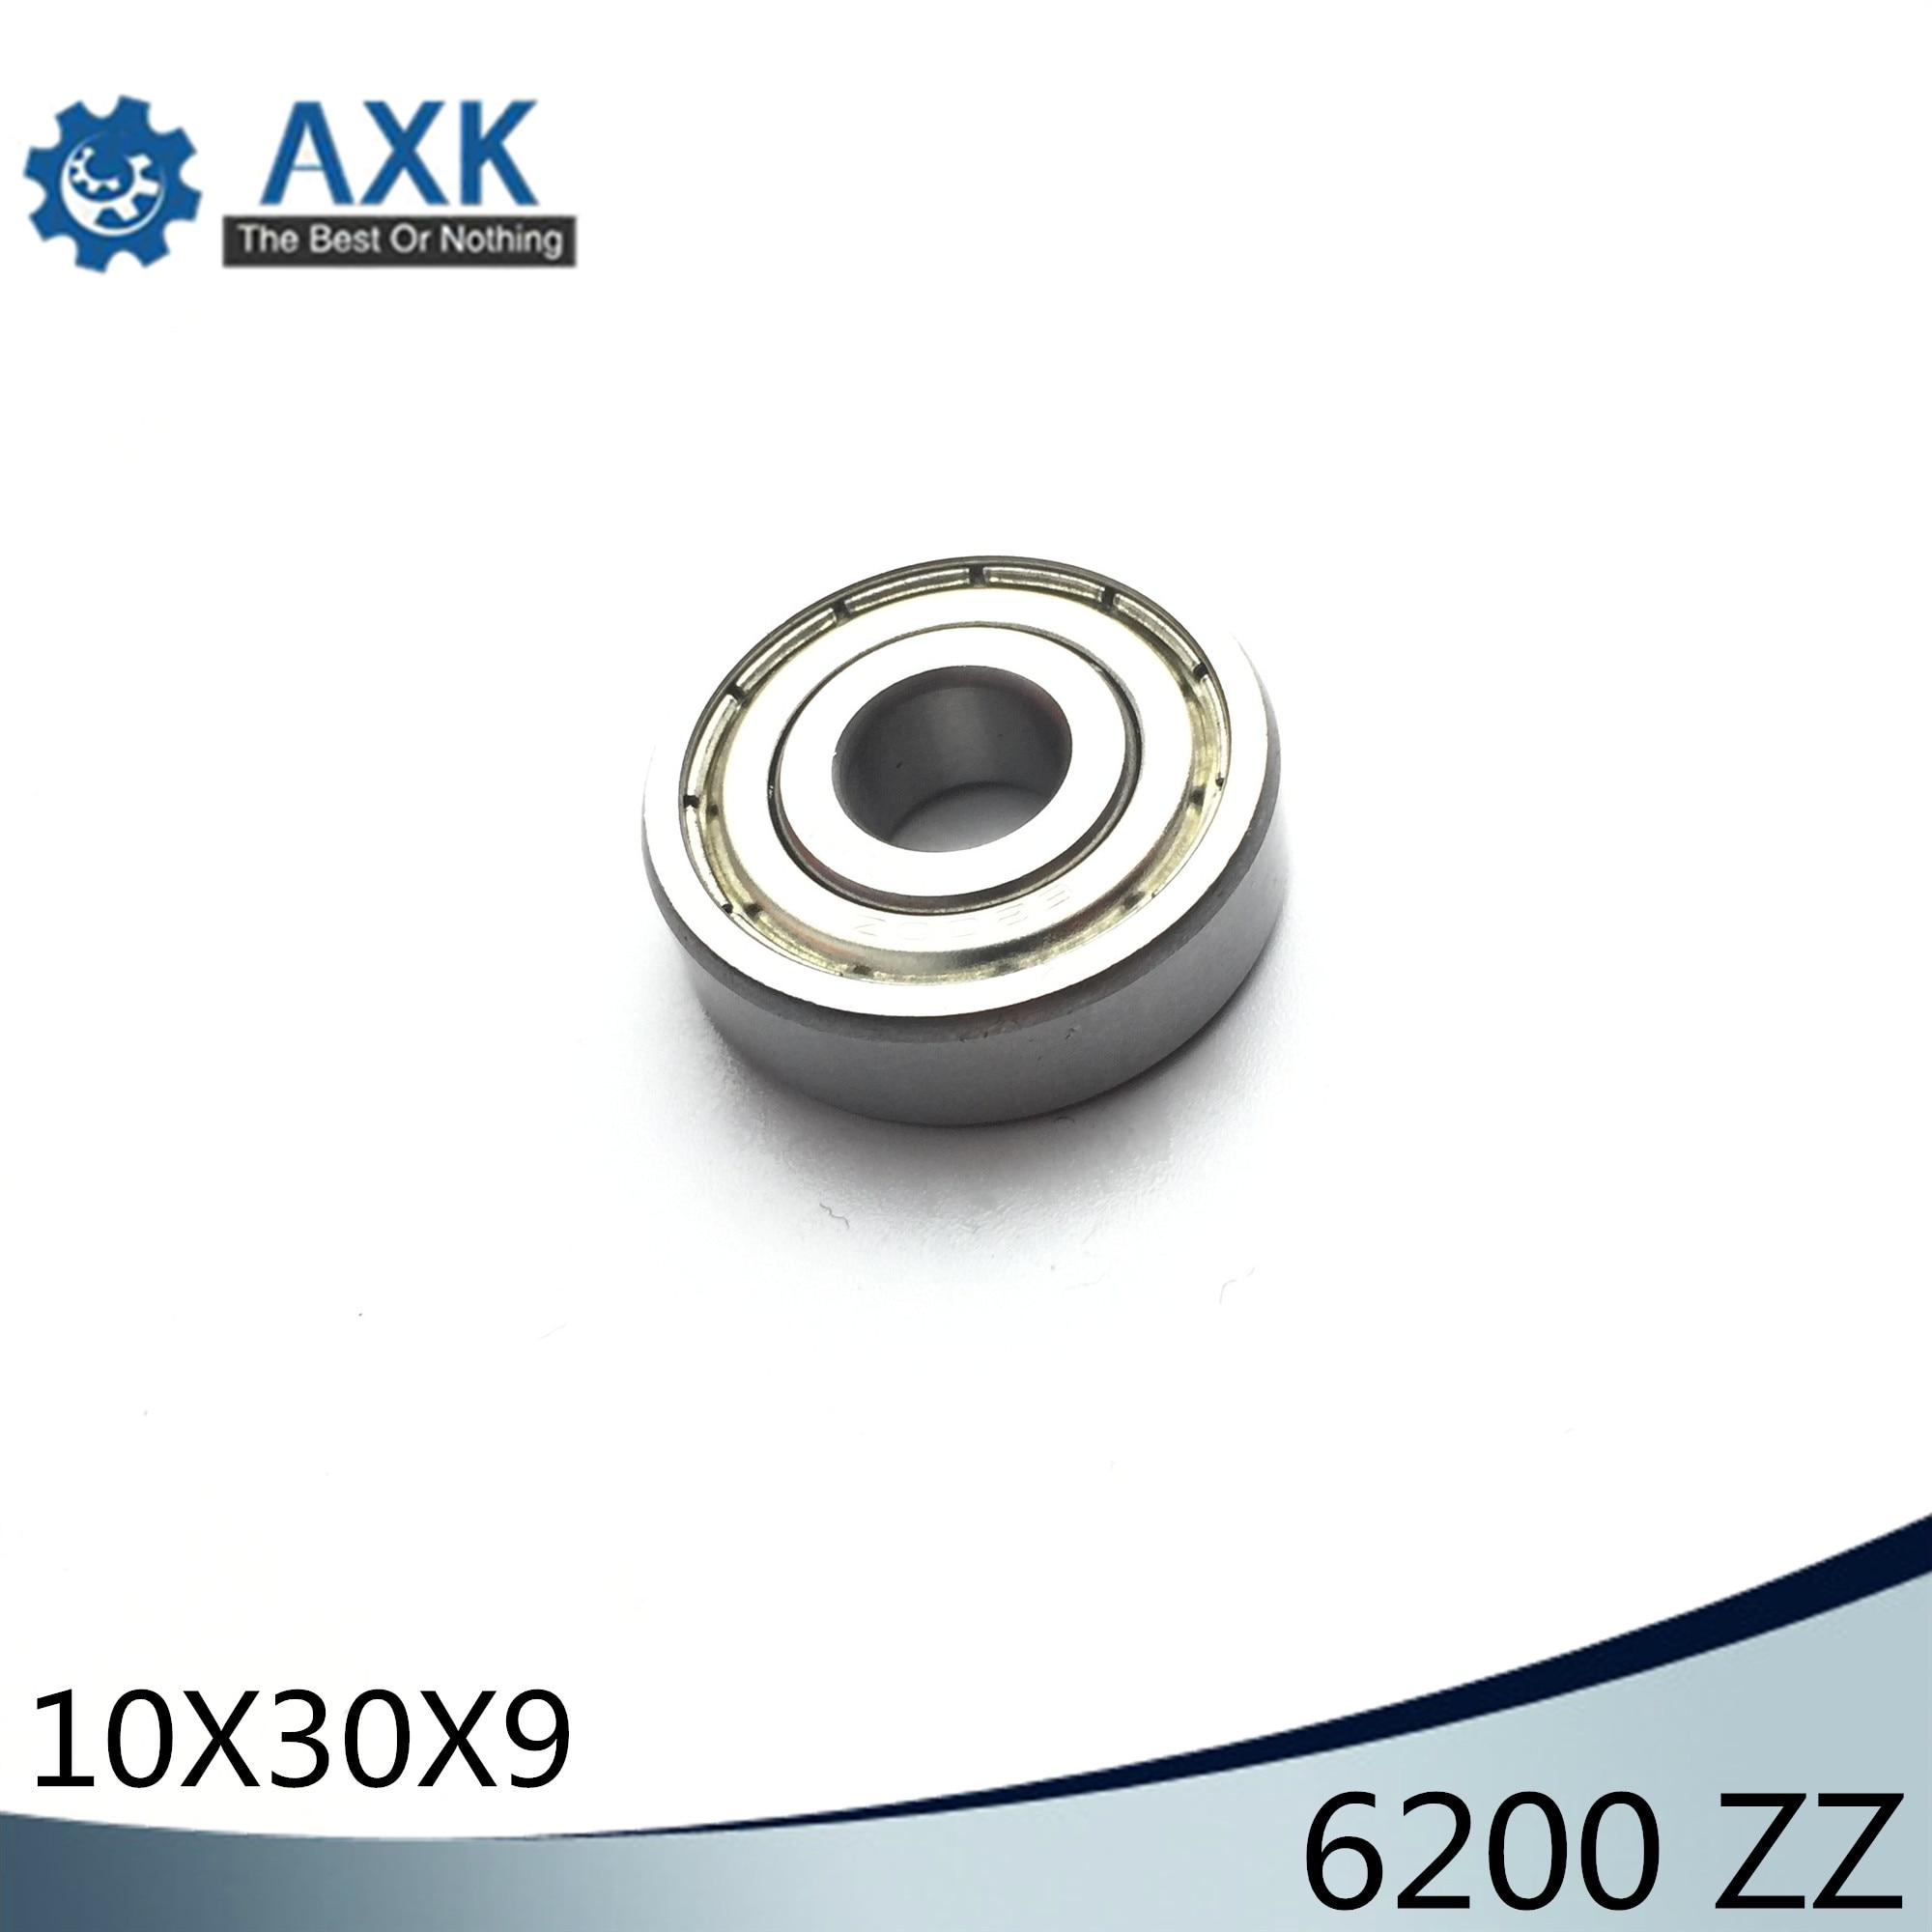 6002ZZ Bearing 15*32*9 mm ABEC-3 8 PC Deep Groove 6002 Z Ball Bearings 6002Z